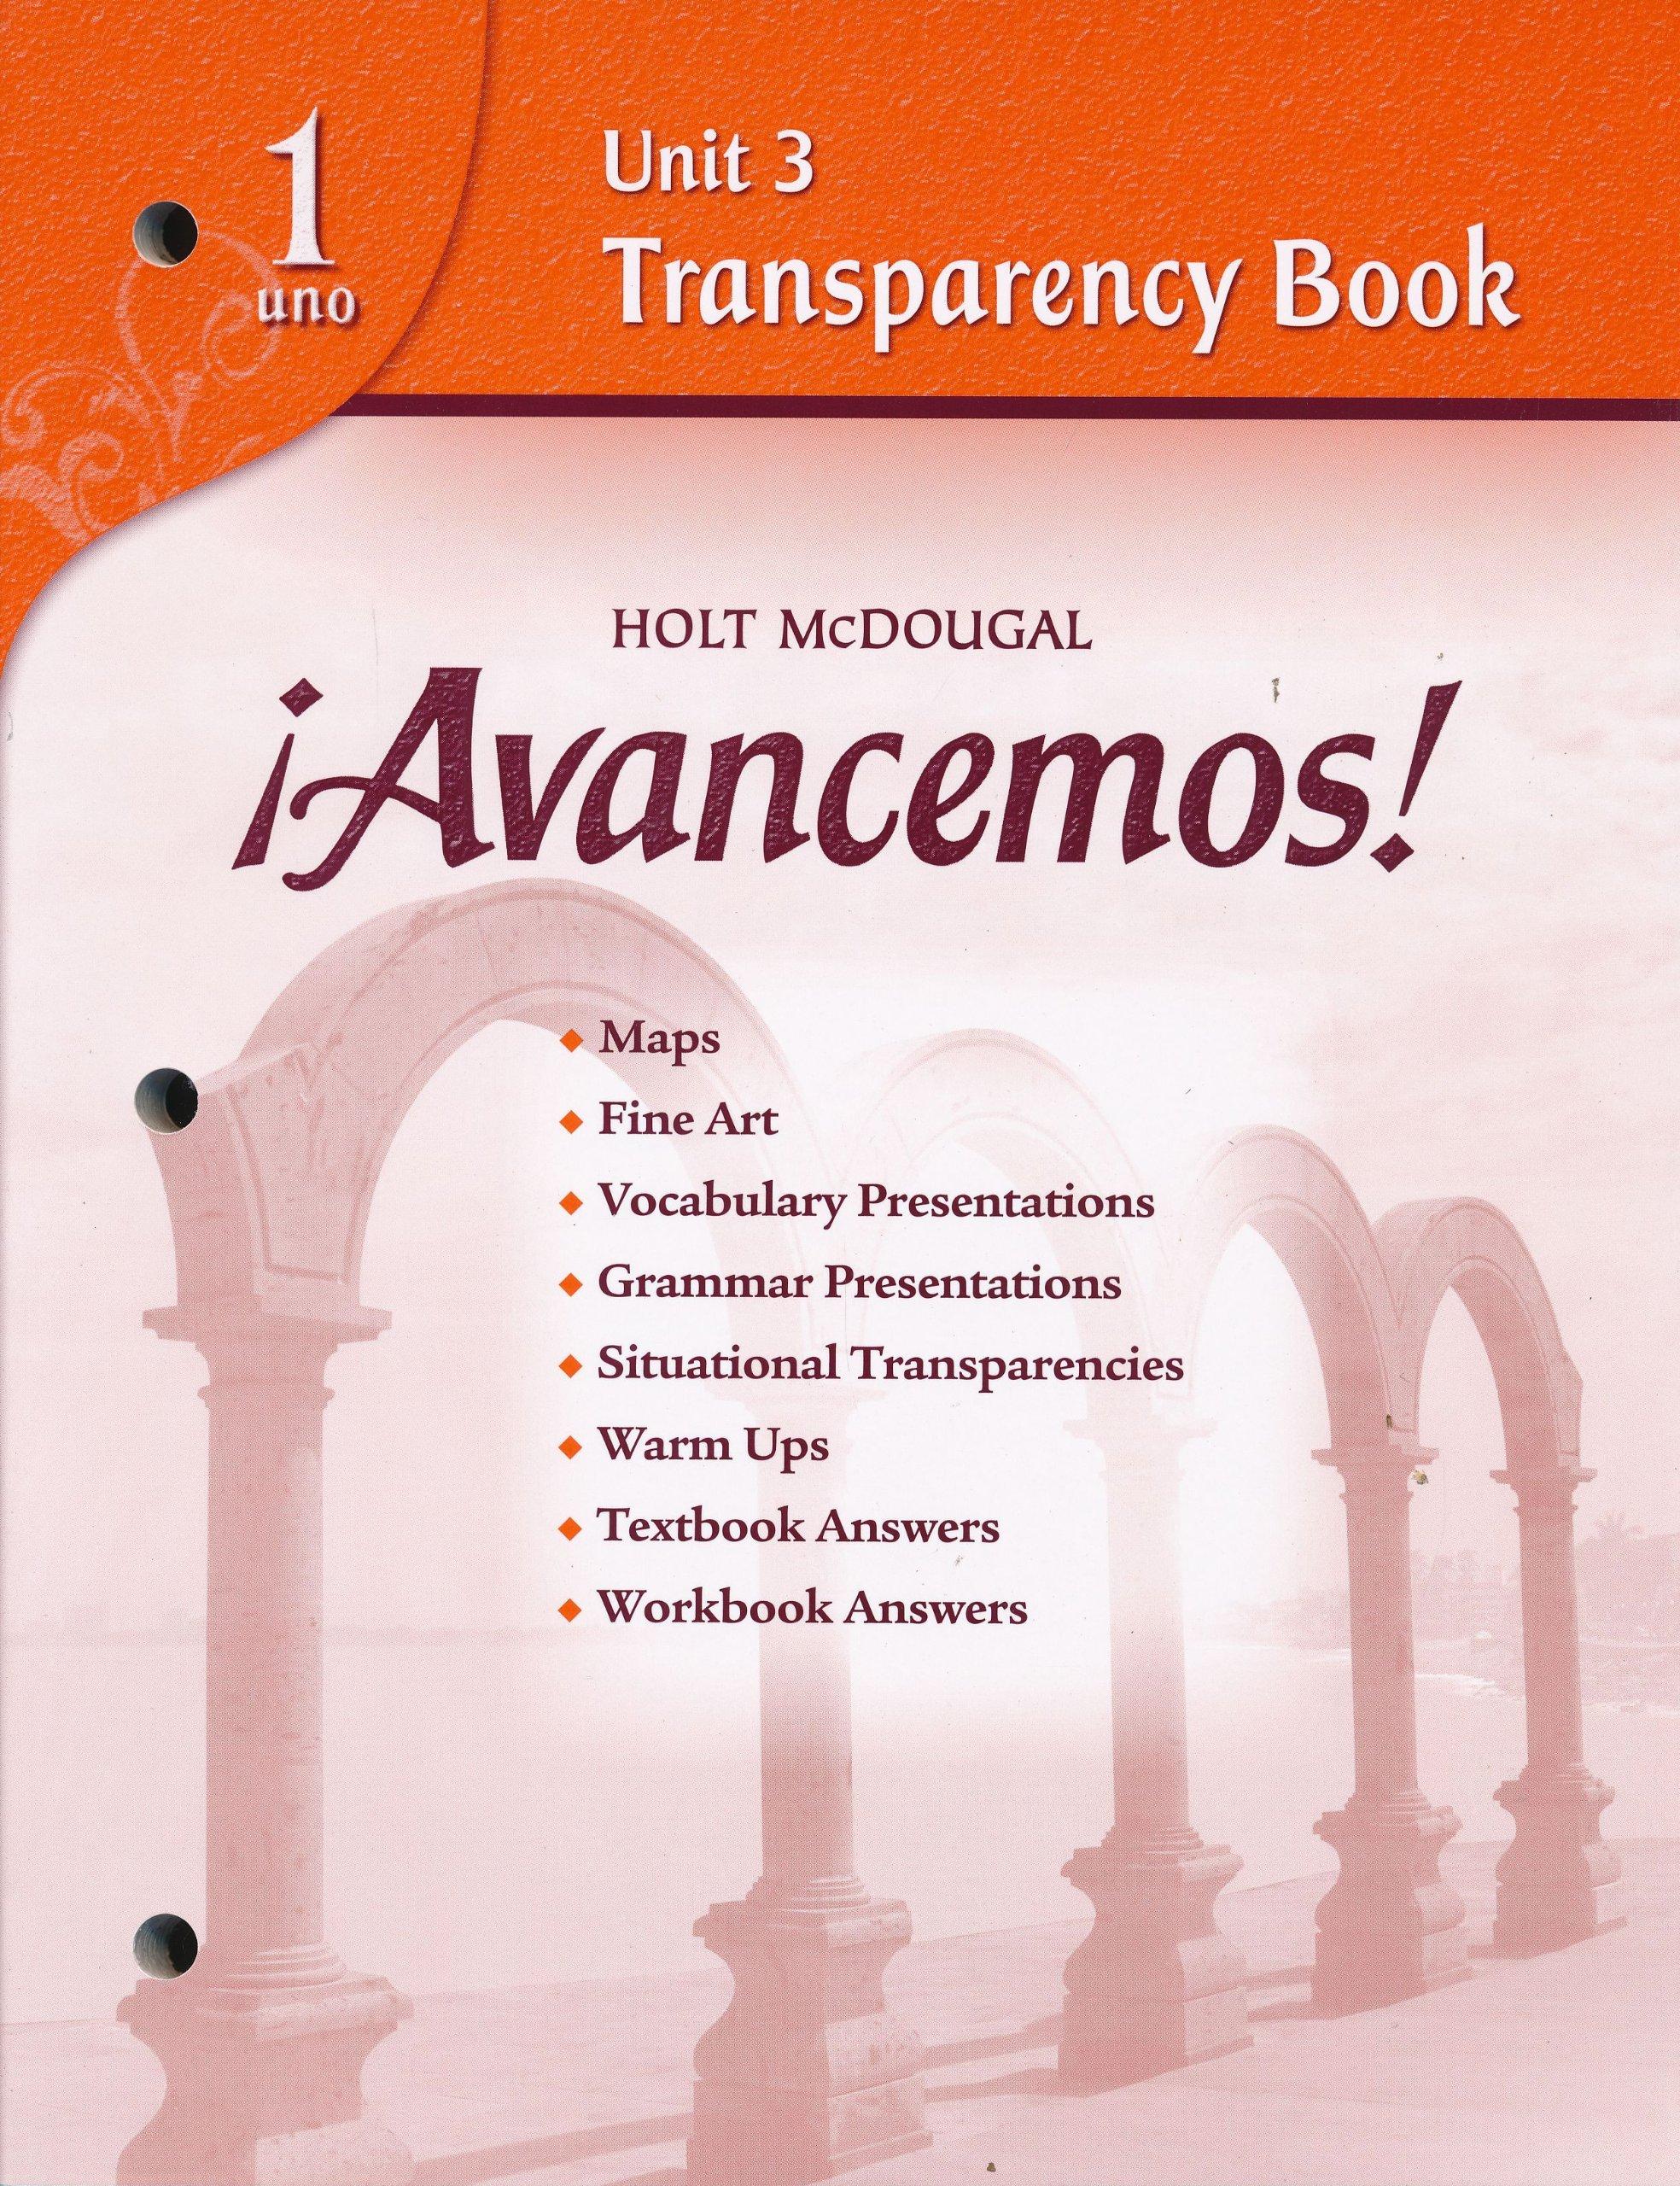 Avancemos! 1 Unit 3 Transparency Book ebook